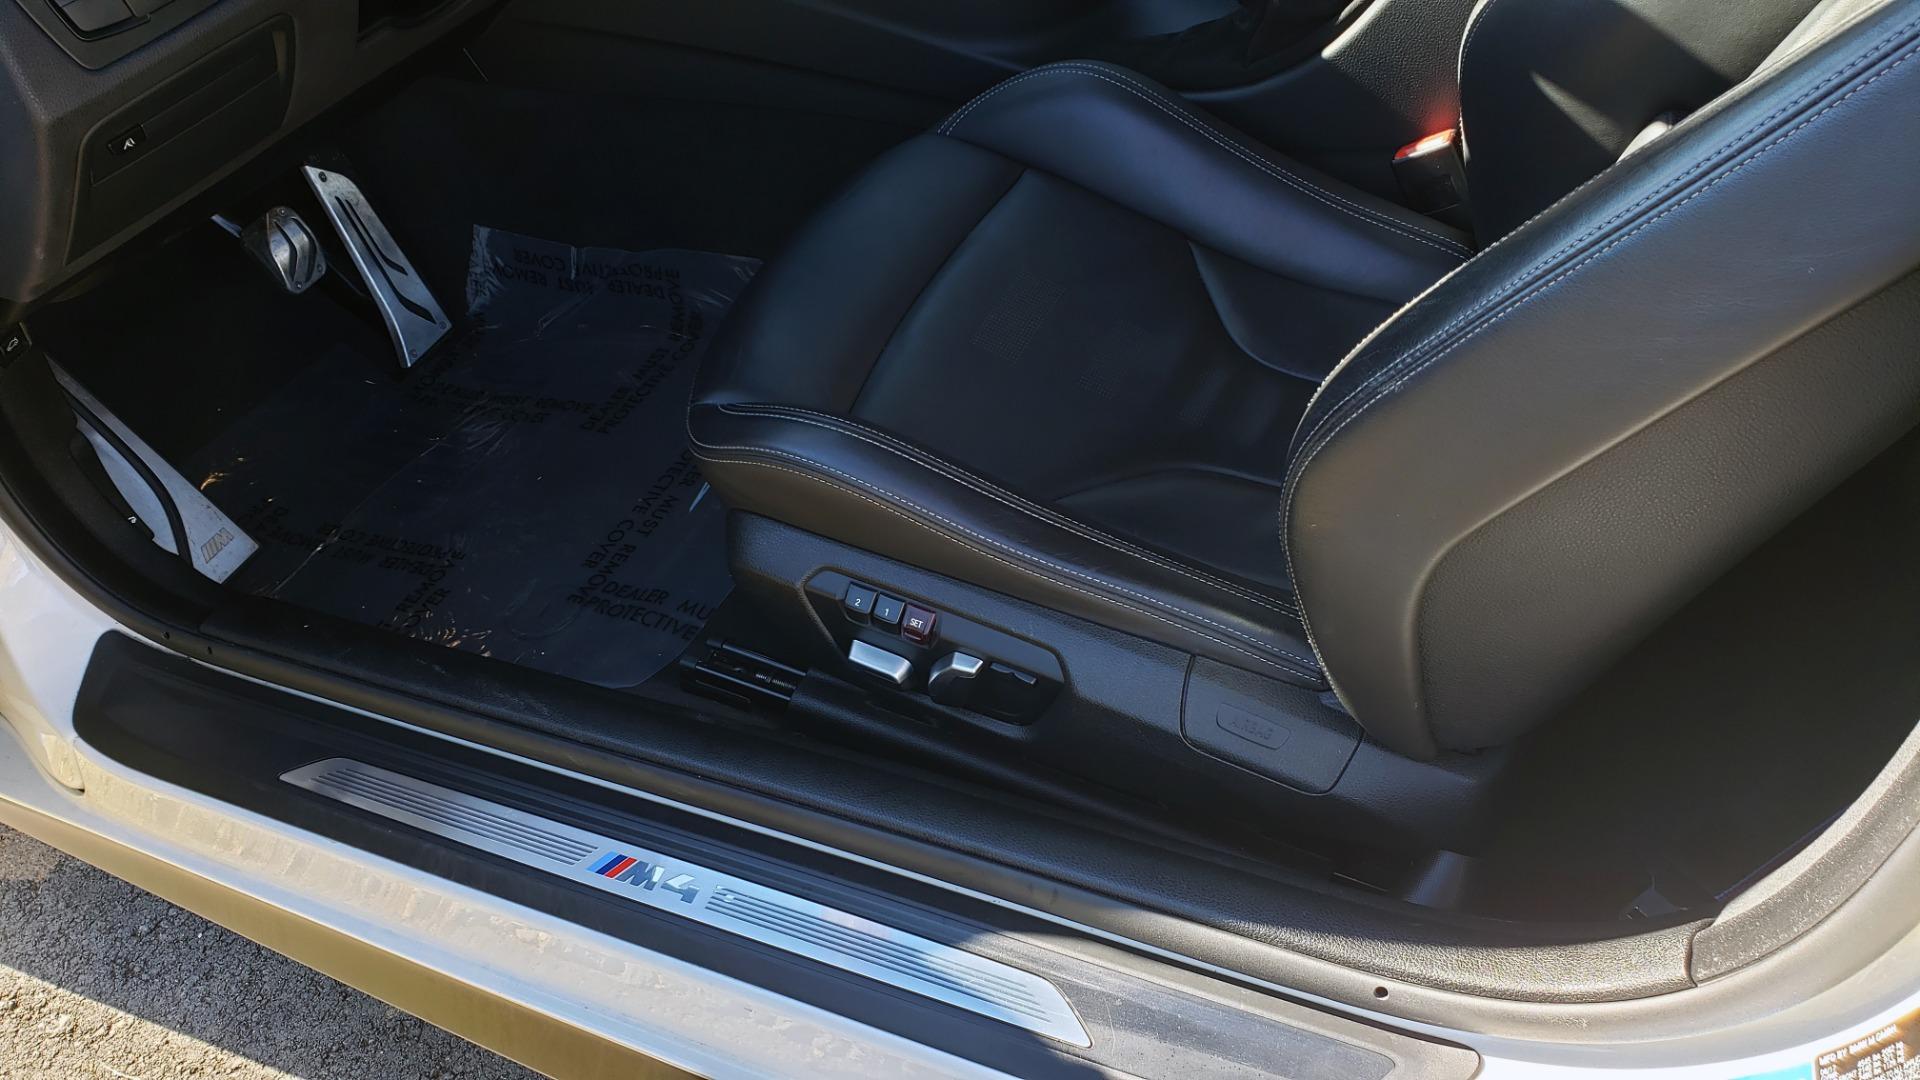 Used 2018 BMW M4 COMP PKG / EXEC / M-DRIVER / PARK CNTRL / ACTIVE BLIND SPOT for sale Sold at Formula Imports in Charlotte NC 28227 36